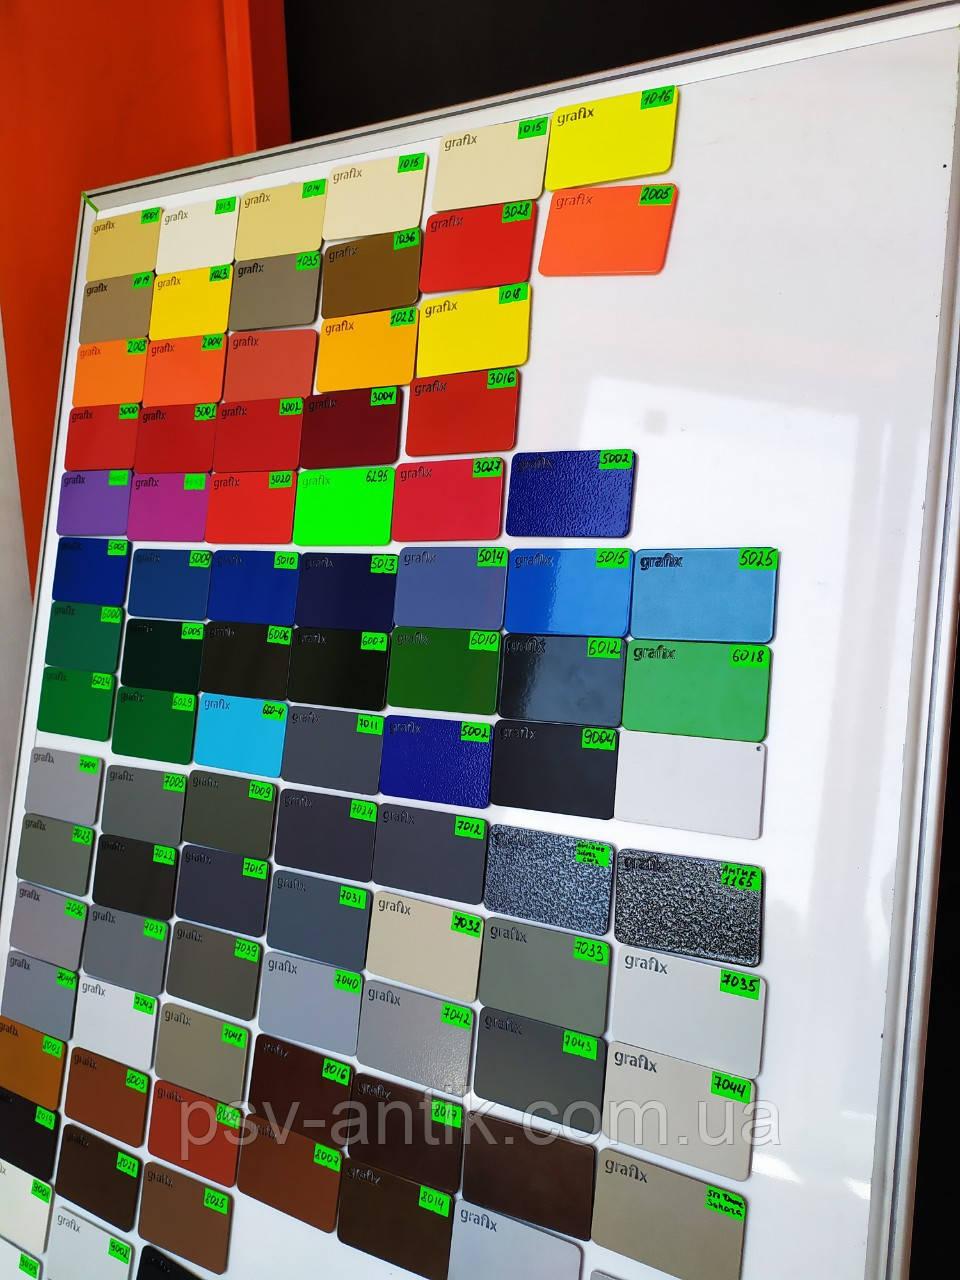 Порошковая краска глянцевая, полиэфирная, архитектурная, 6033